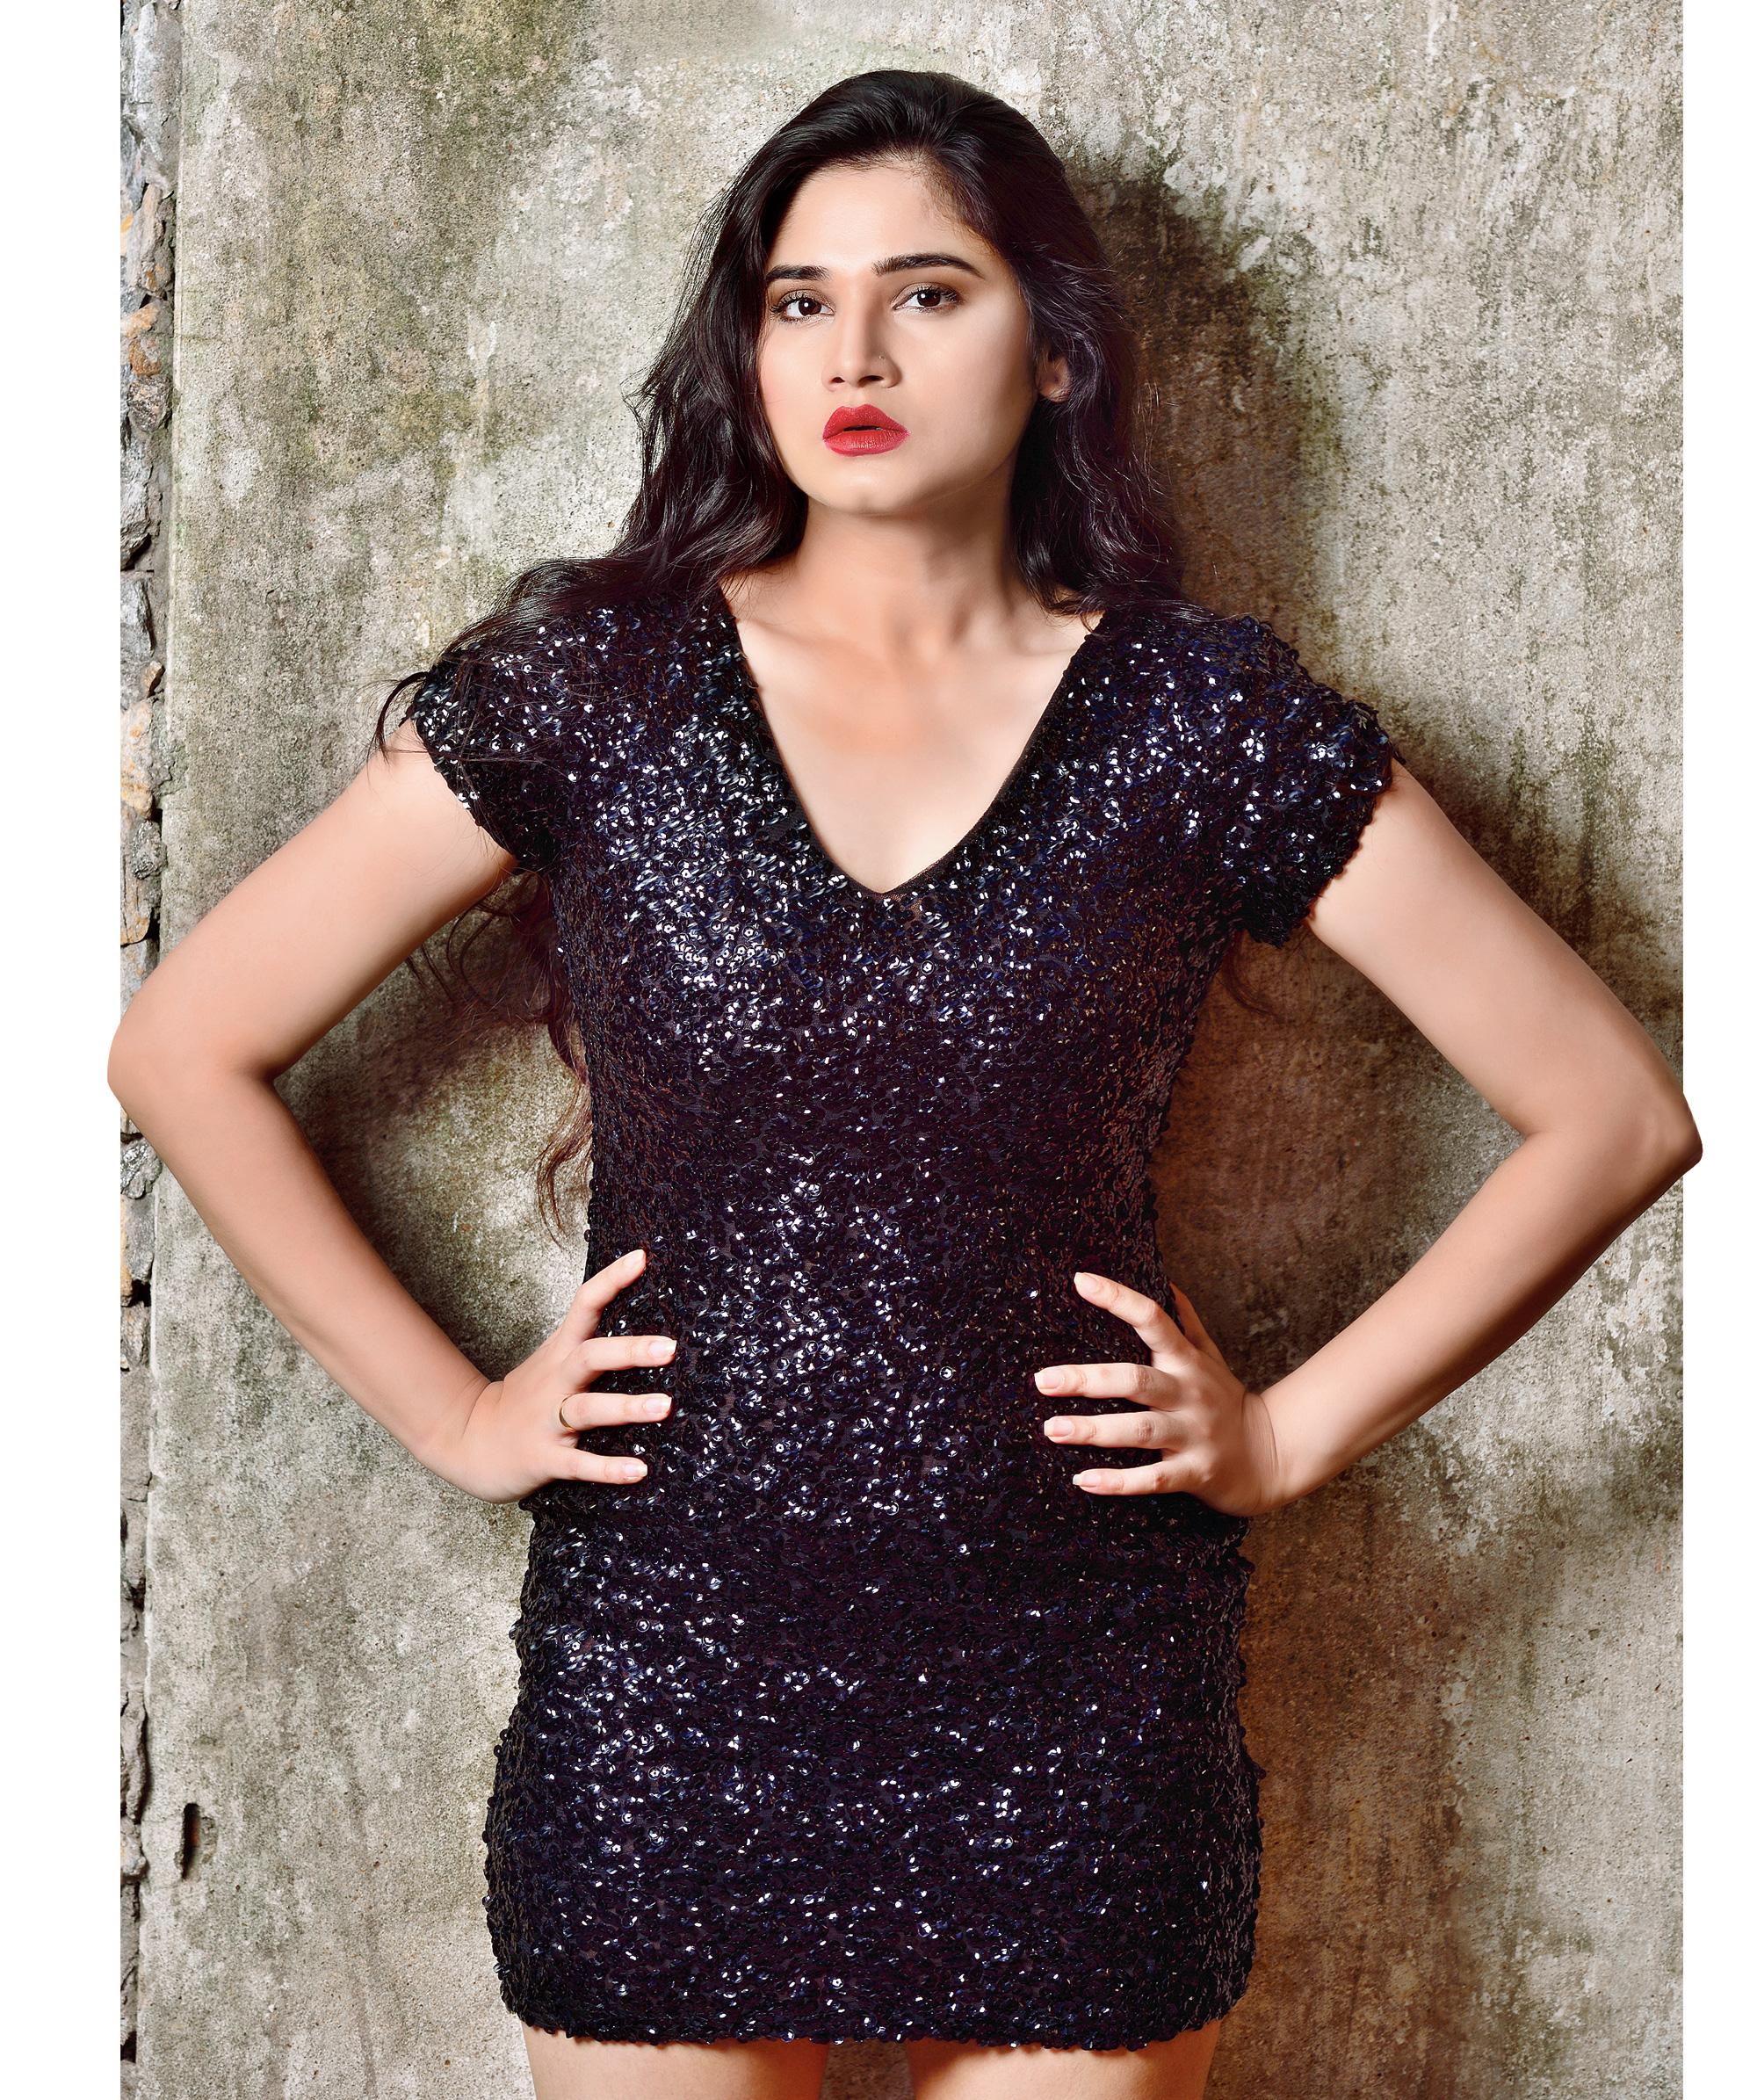 Model Bazla Reyaz in metallic black short dress